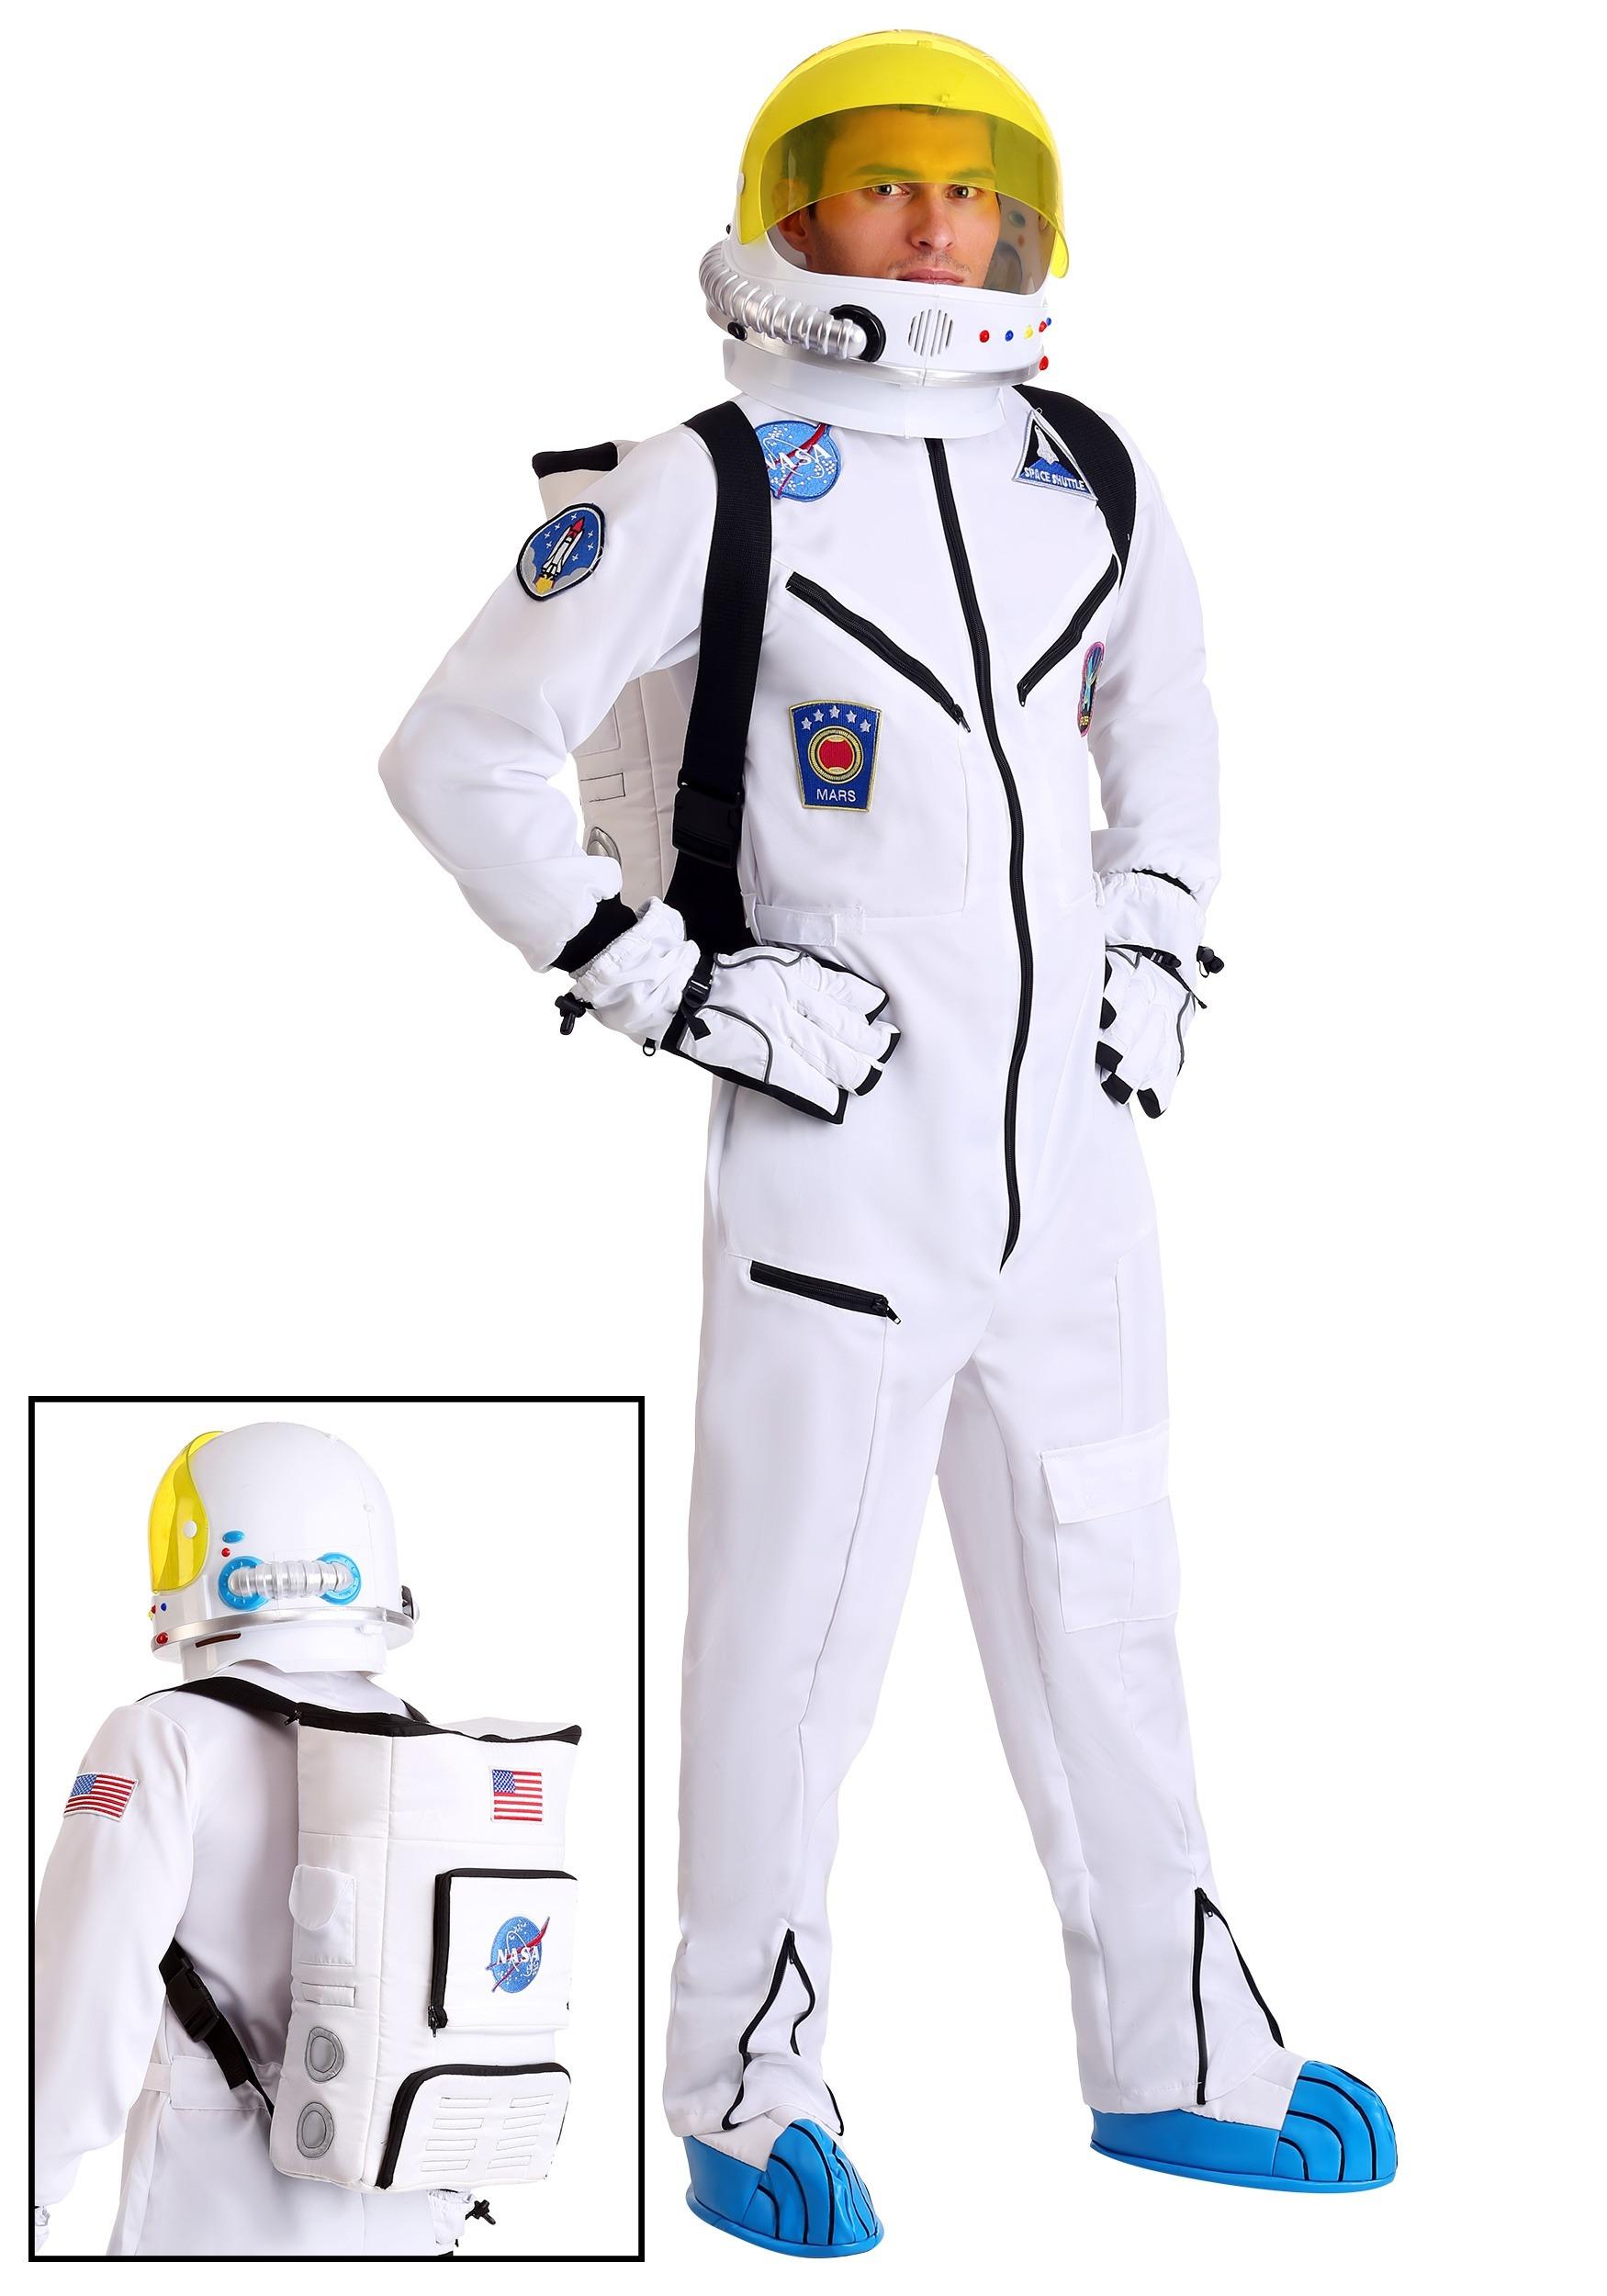 7a9ed7b48 White Astronaut Jumpsuit Adult Costume